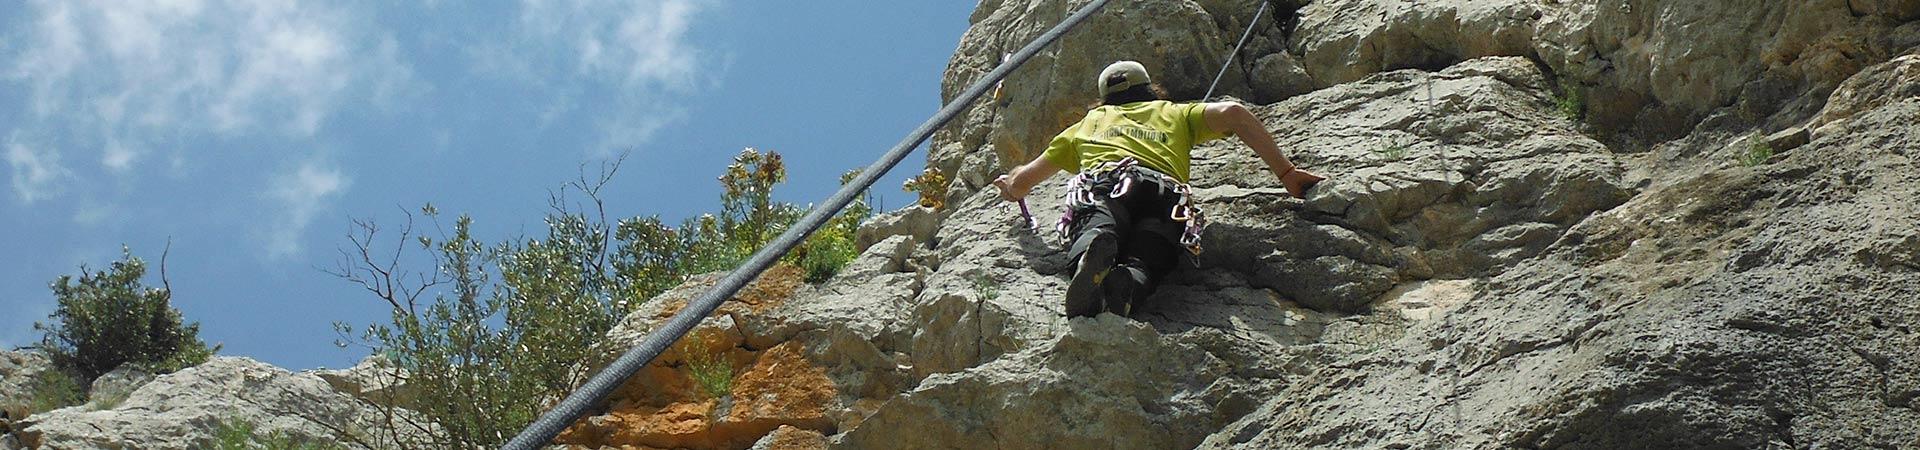 curs-nivell-mig-escalada-esportiva-2-dies